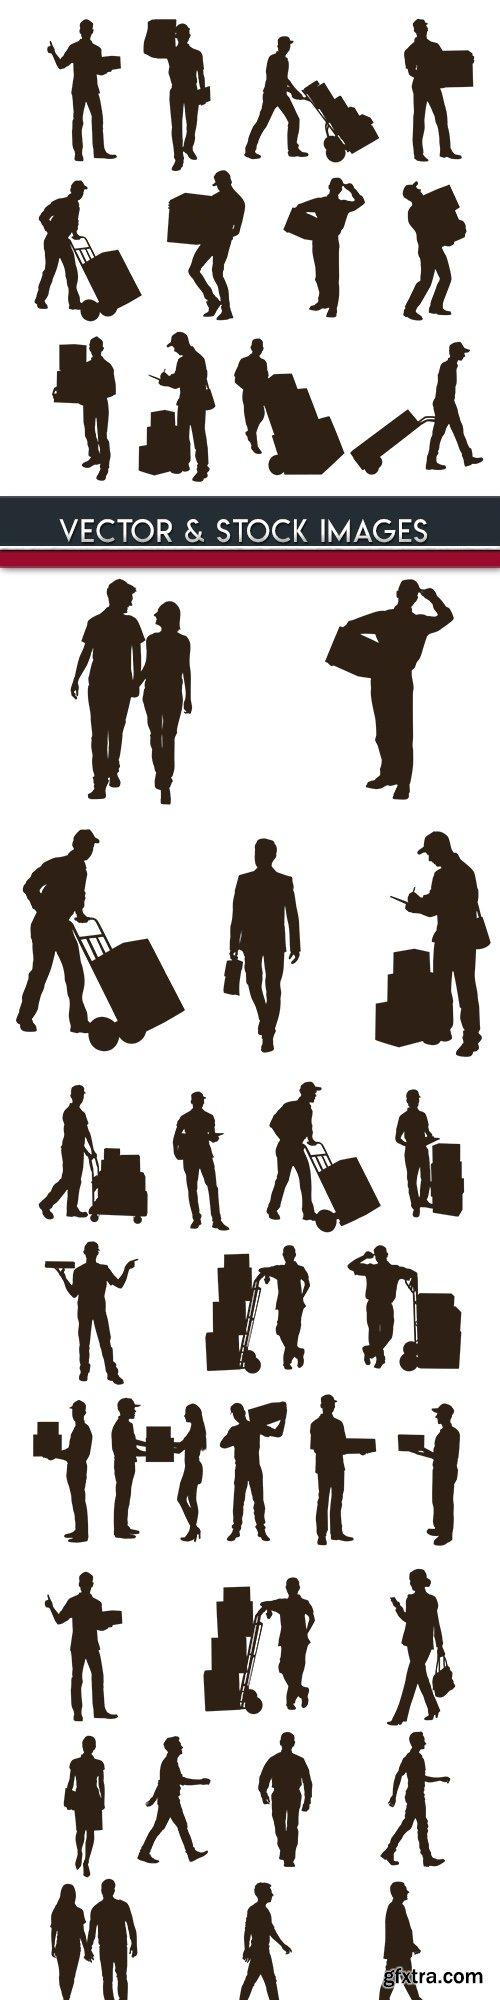 Men and women lifestyle design silhouettes